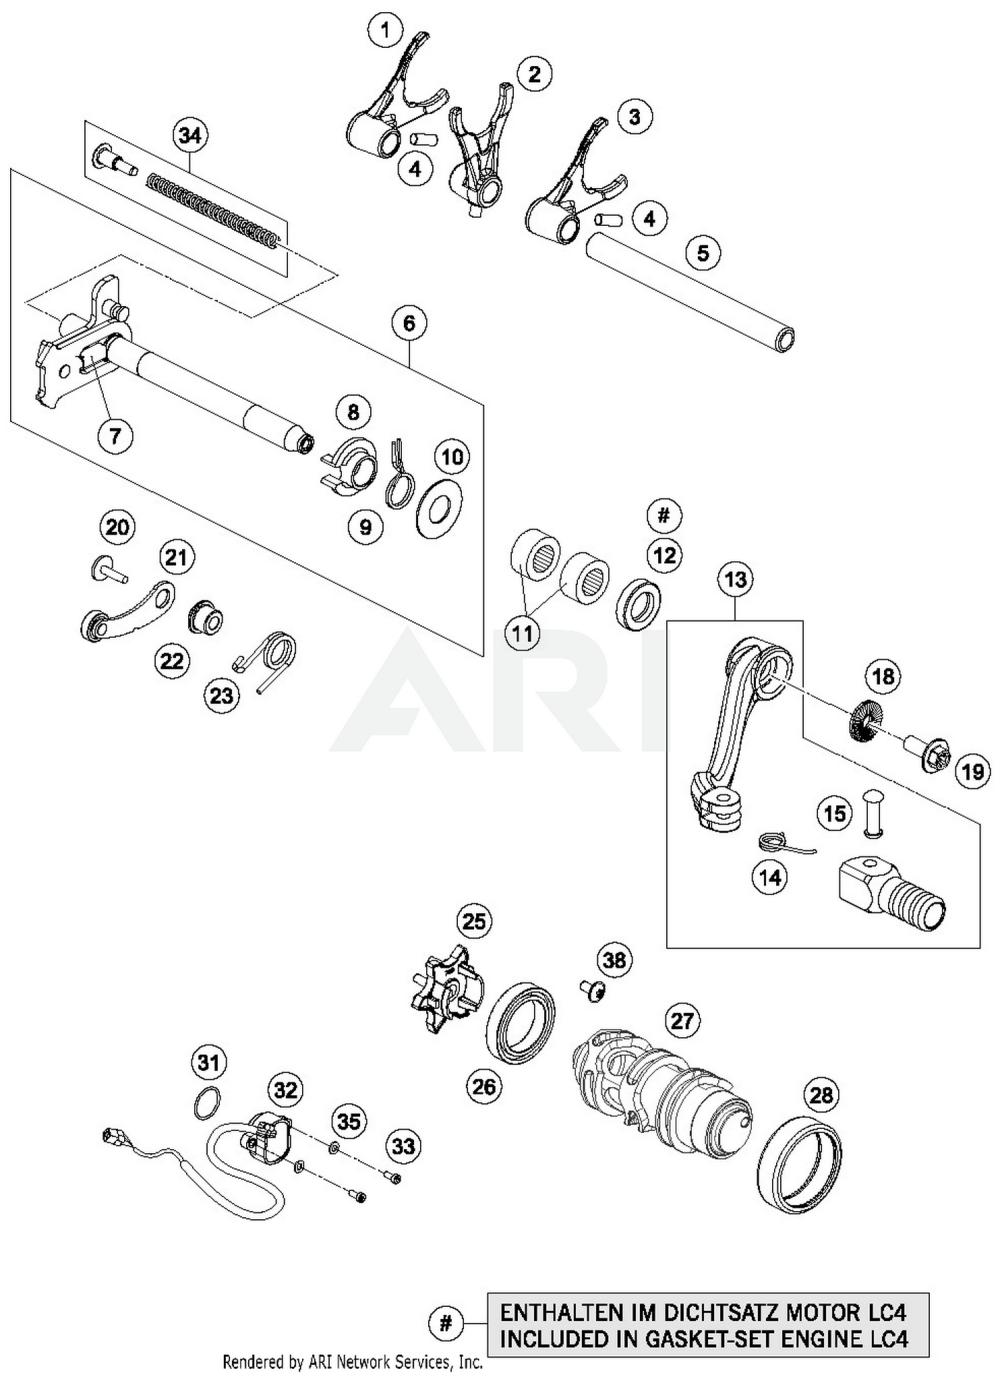 medium resolution of 2018 ktm 690 enduro r abs shifting mechanism parts best oem ktm 690 enduro parts list ktm 690 parts diagram